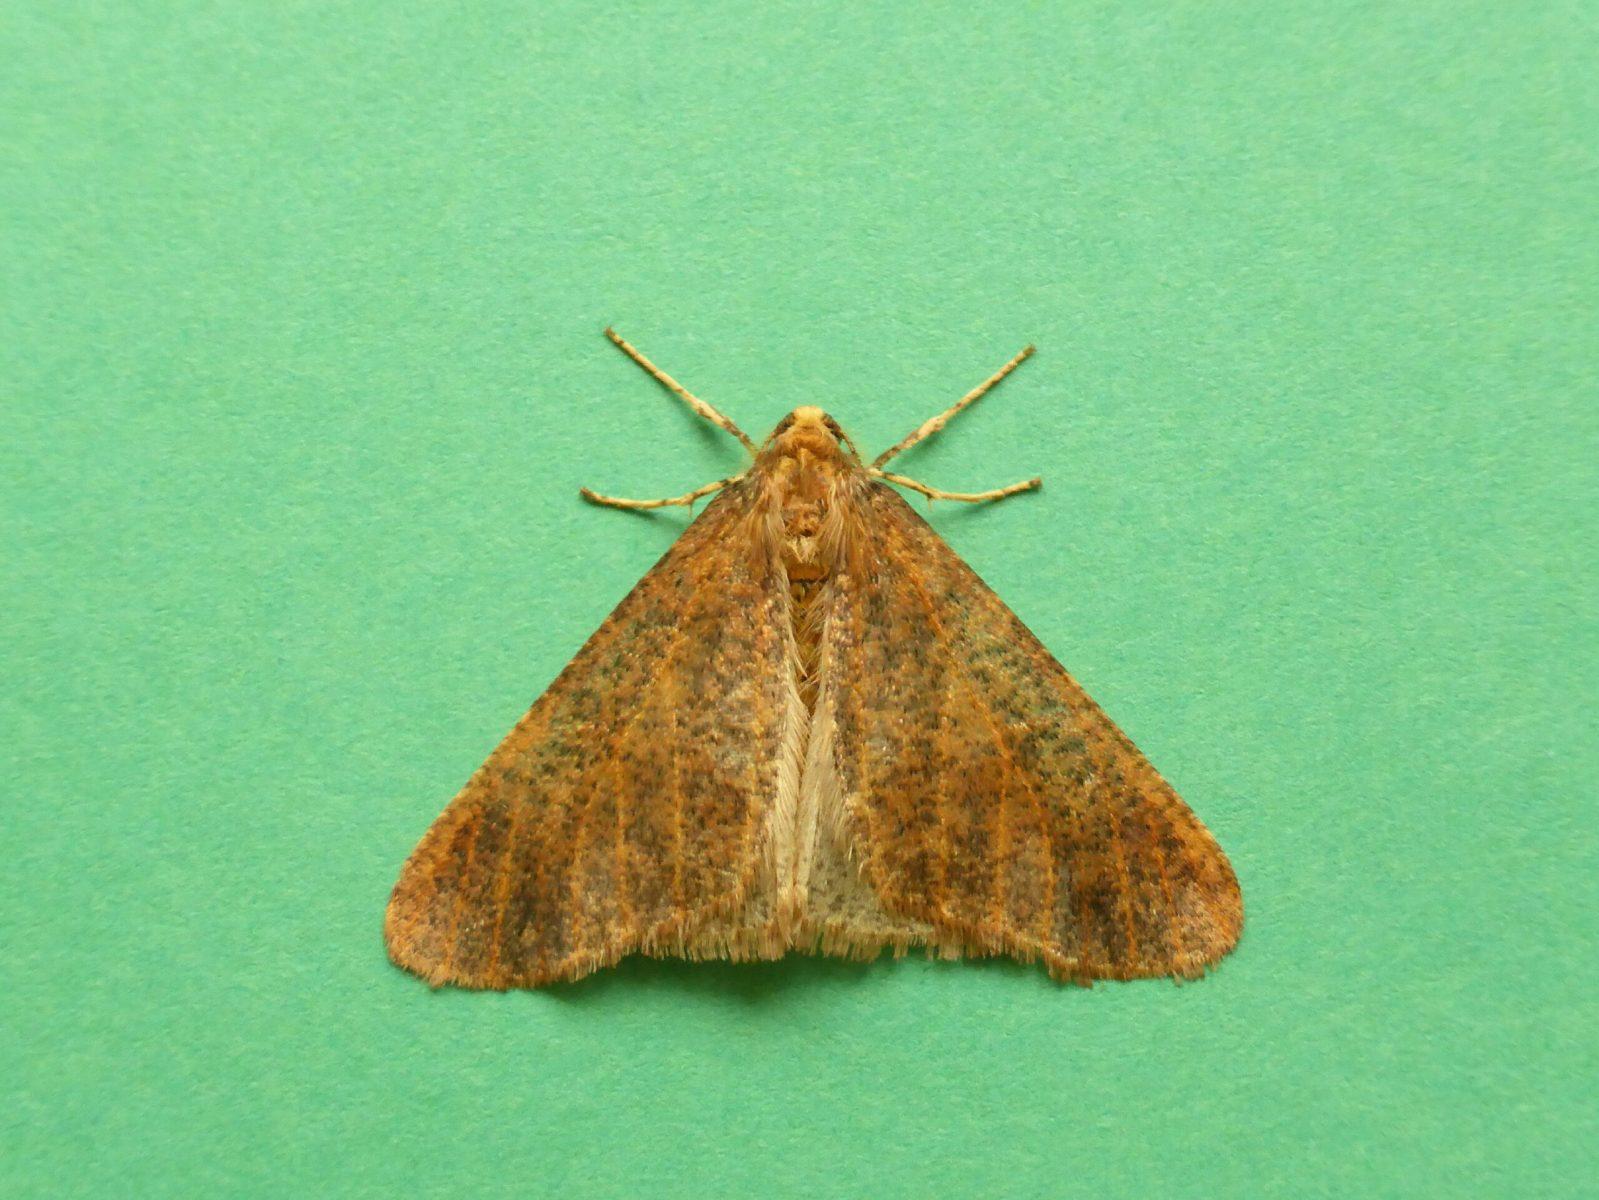 Erabbis defoliaria - Mottled Umber, Kirk Smeaton